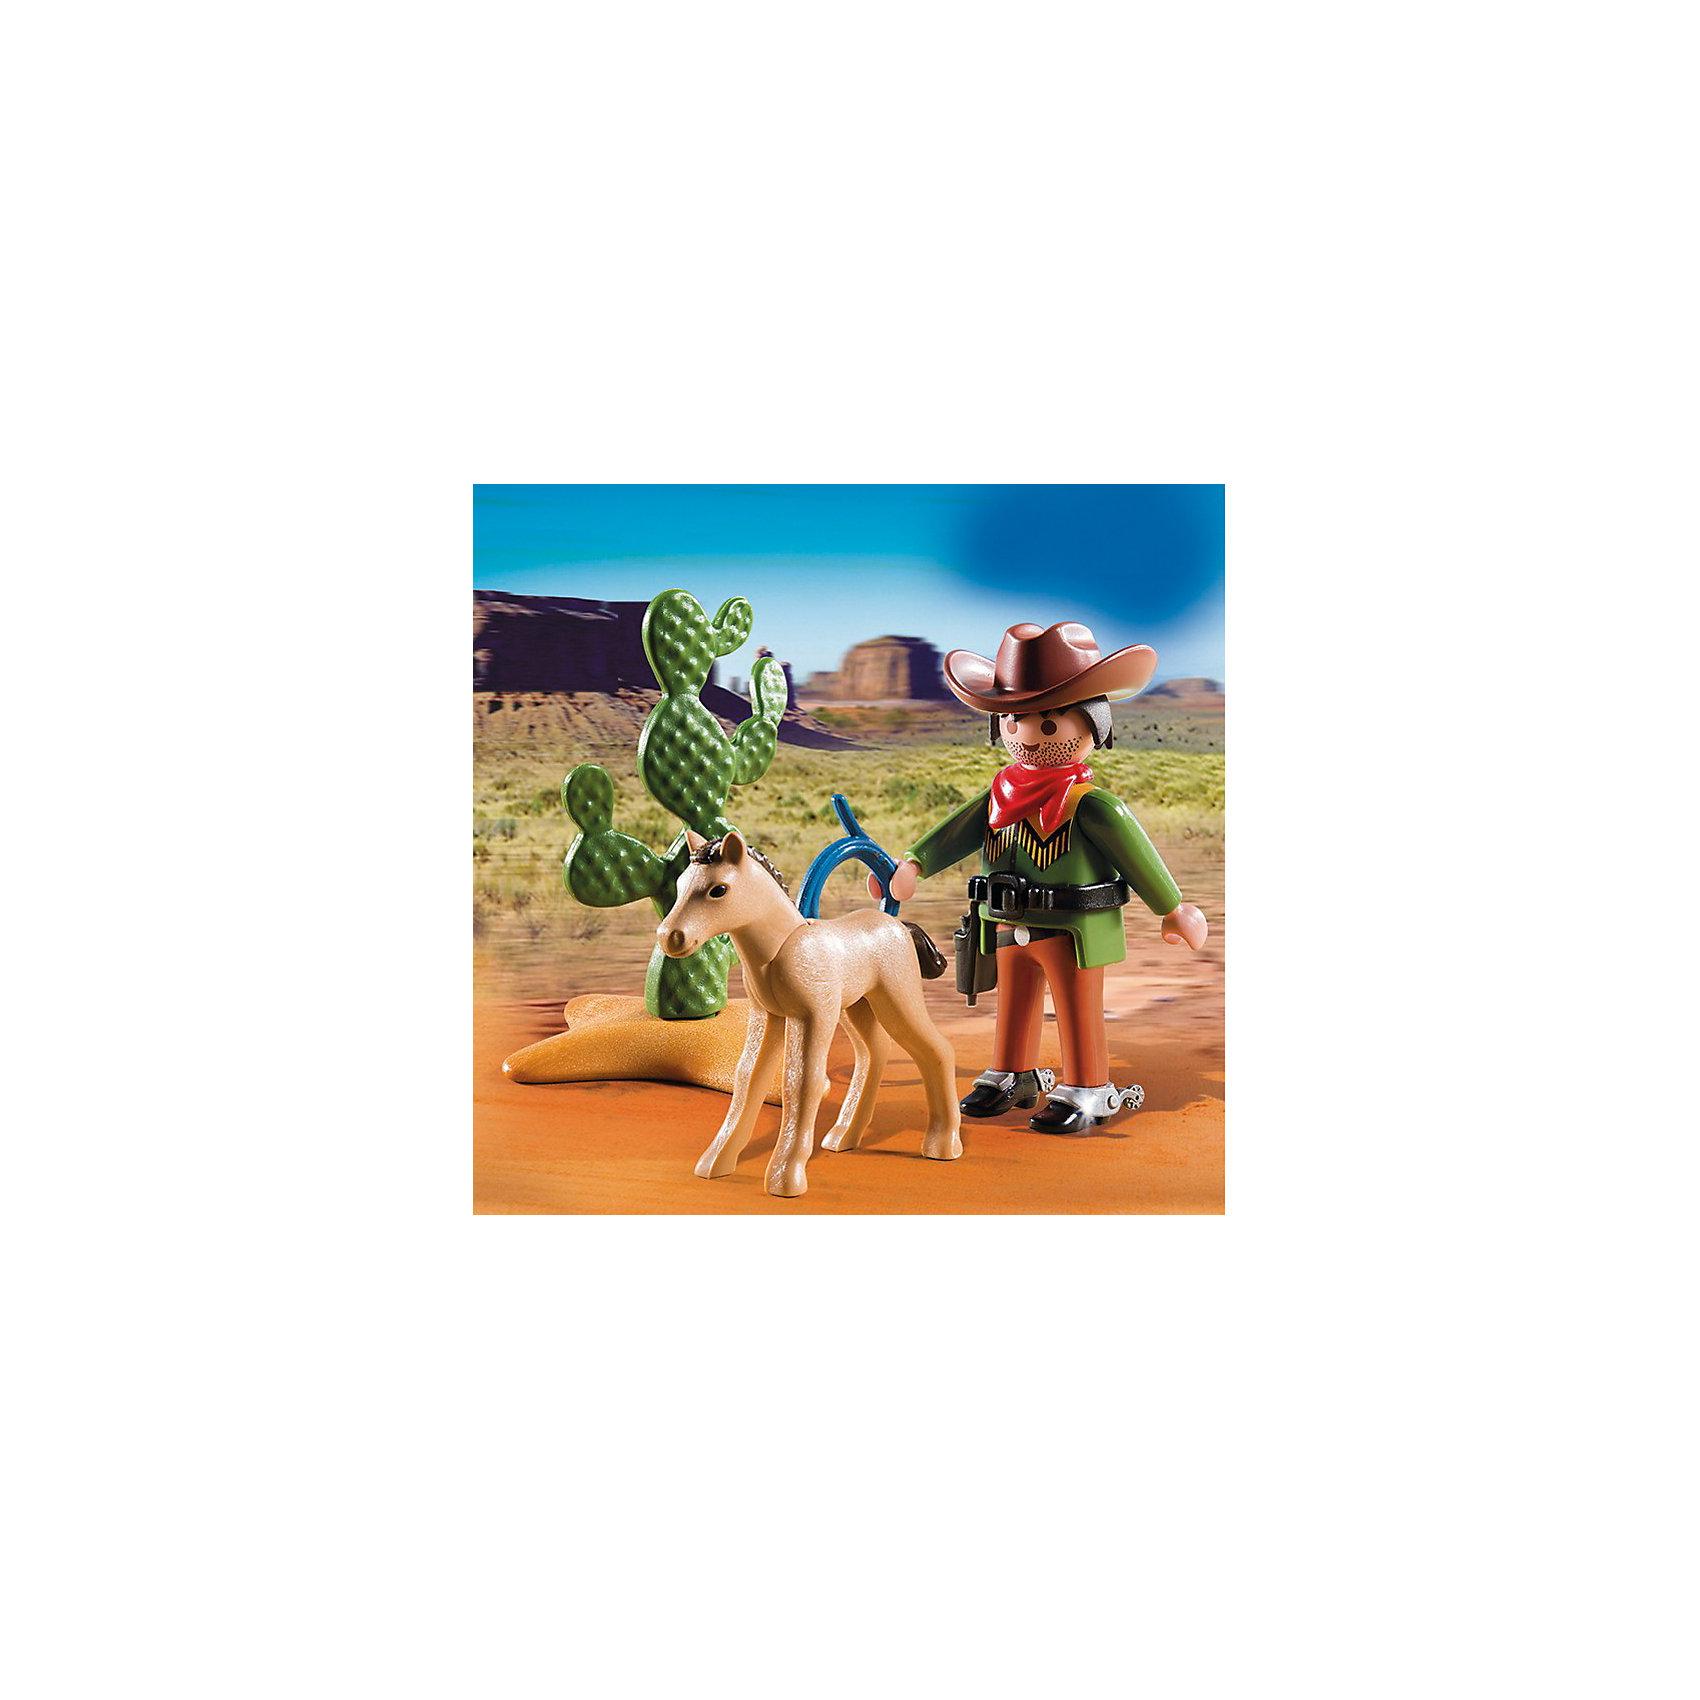 PLAYMOBIL® Экстра-набор: Ковбой с жеребенком, PLAYMOBIL playmobil® playmobil 5411 экстра набор ангел и демон